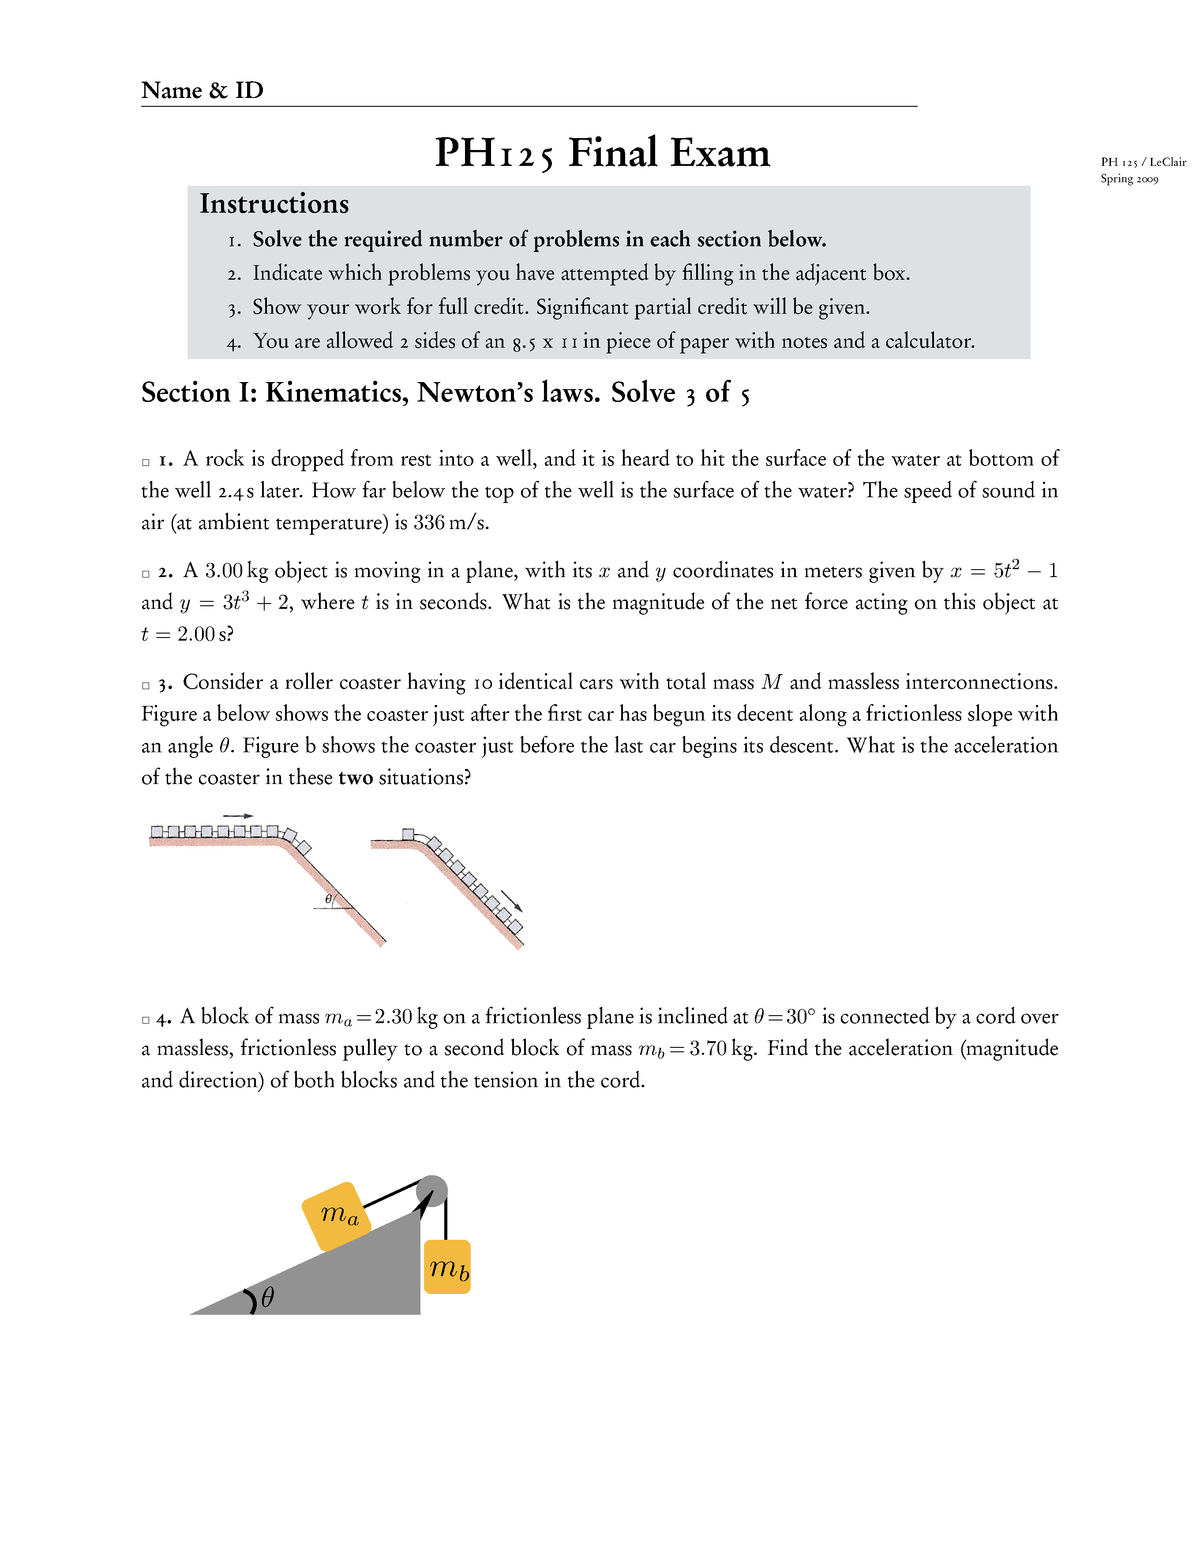 Exam 2009 - PH 125: Honors Gen Ph W/Calculus - StuDocu